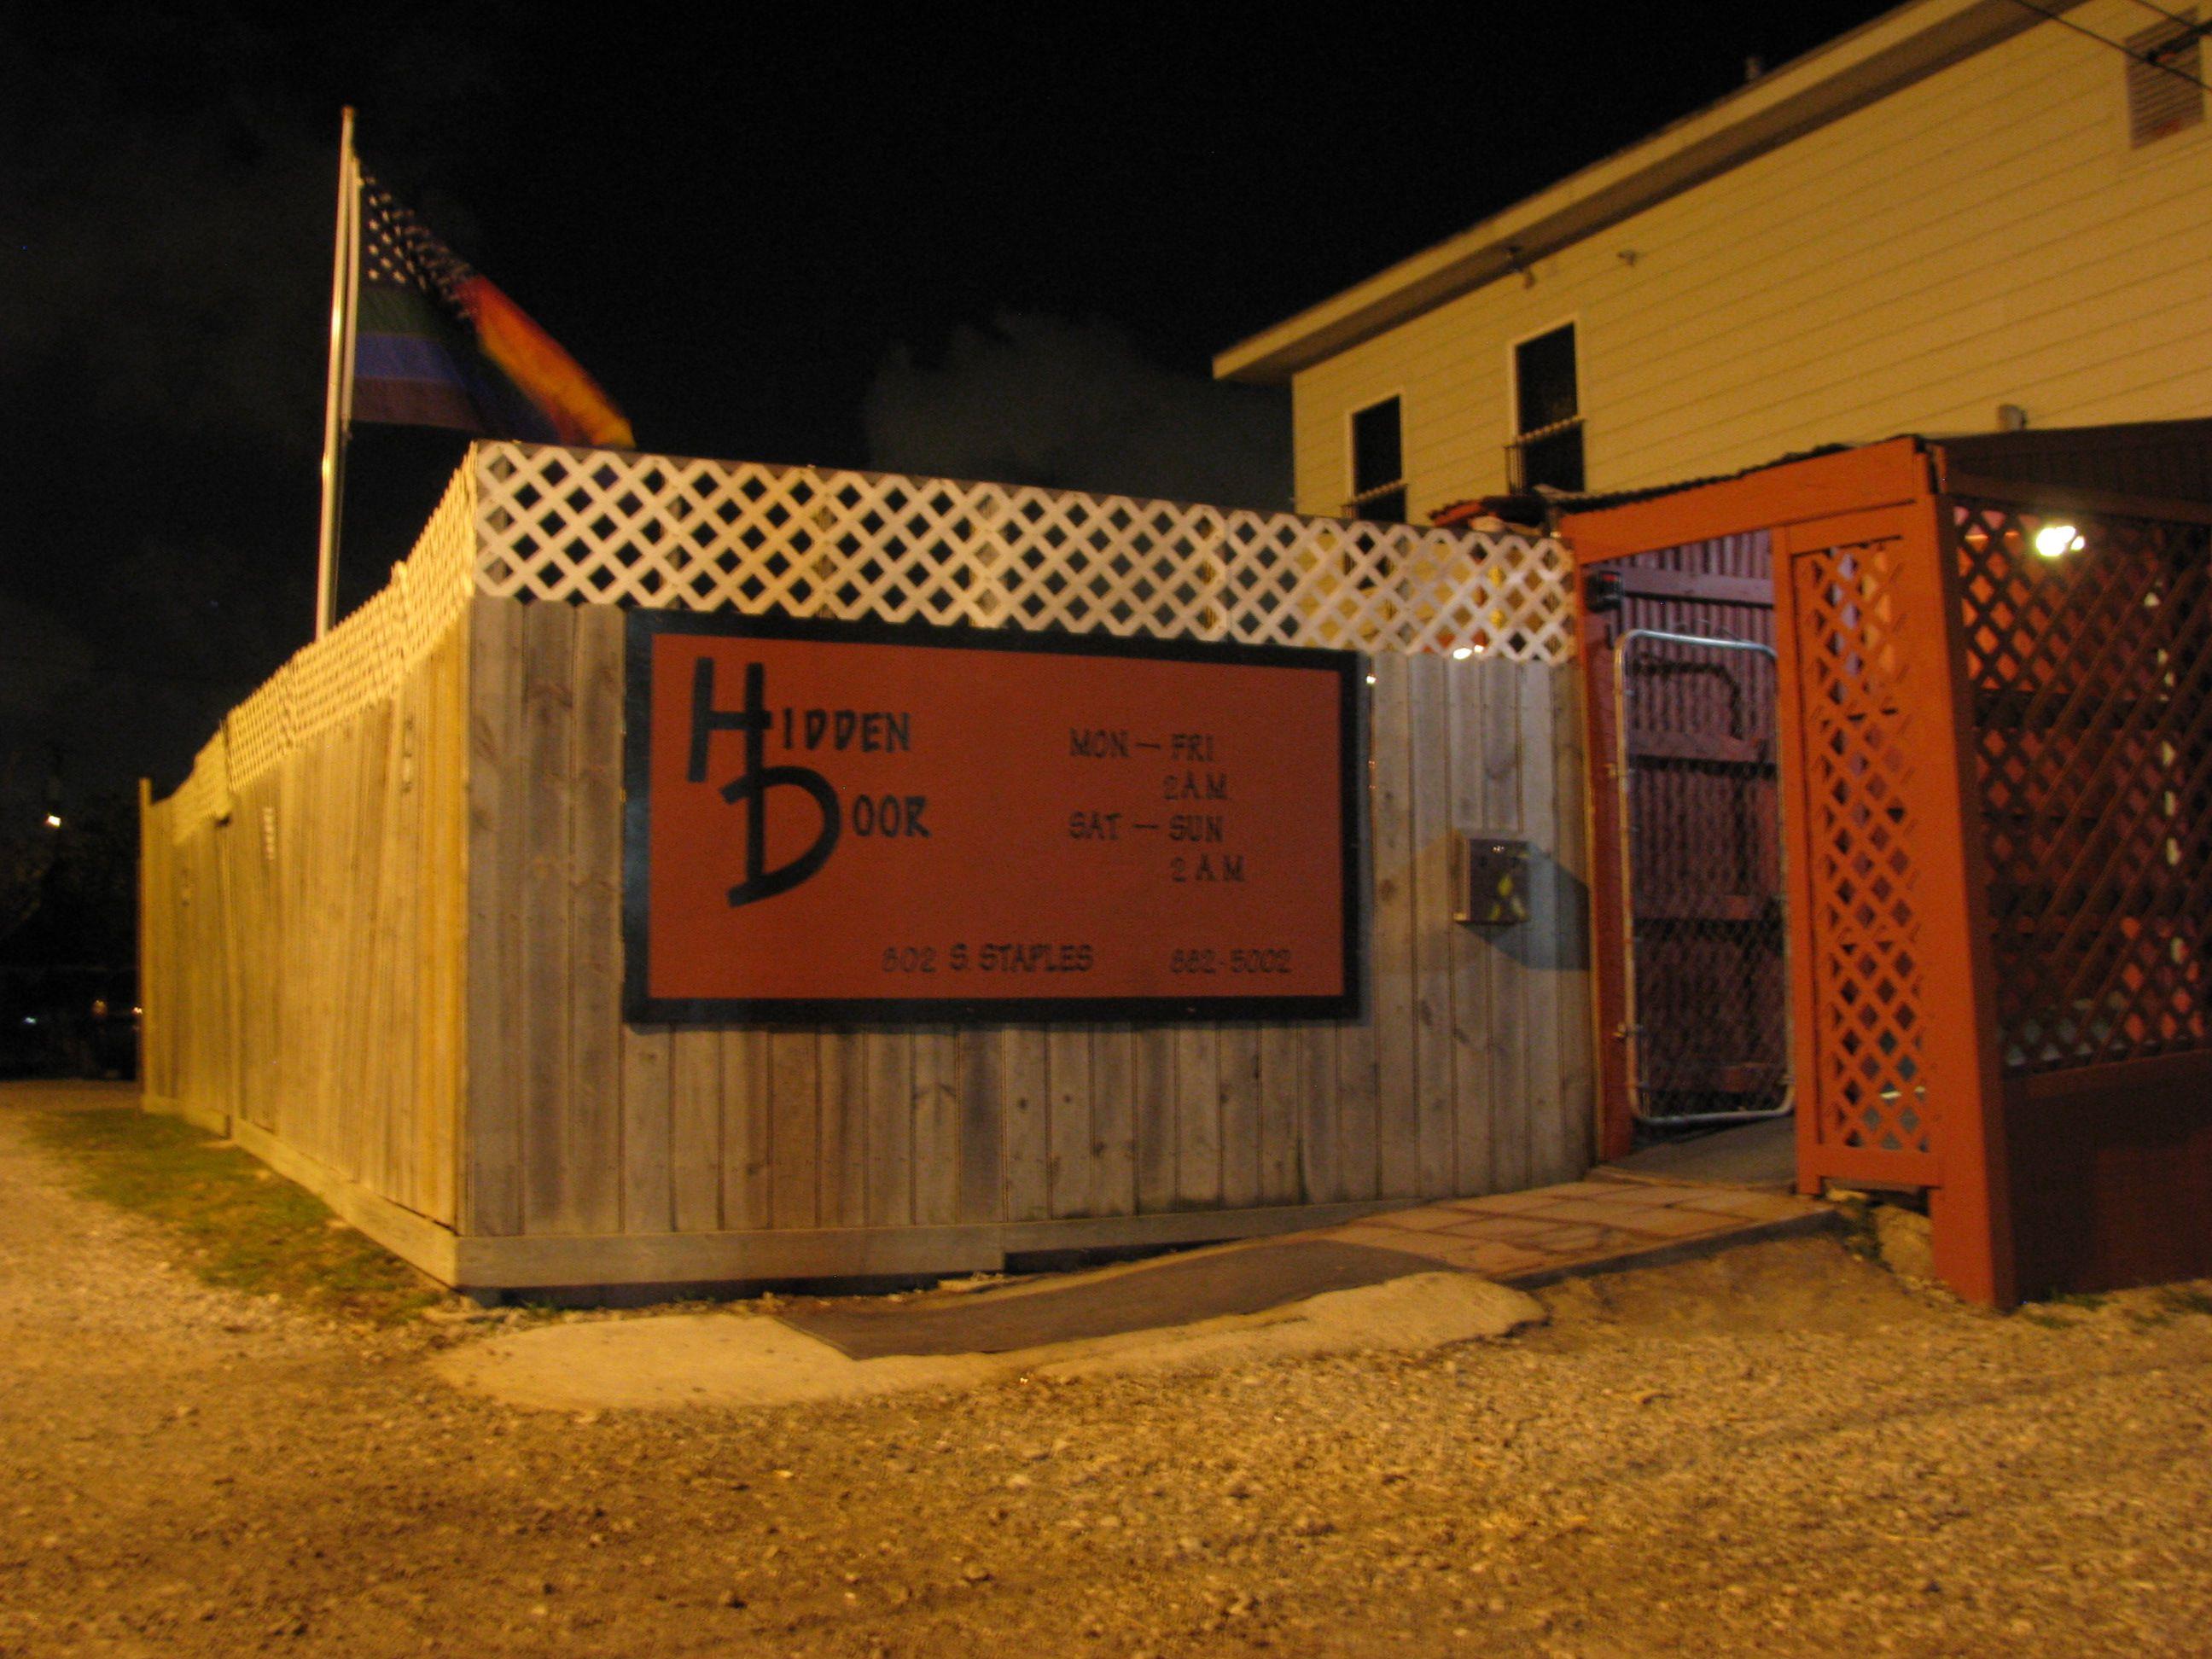 Lgbtq community protests texas bar for refusing entry to gay man wearing makeup